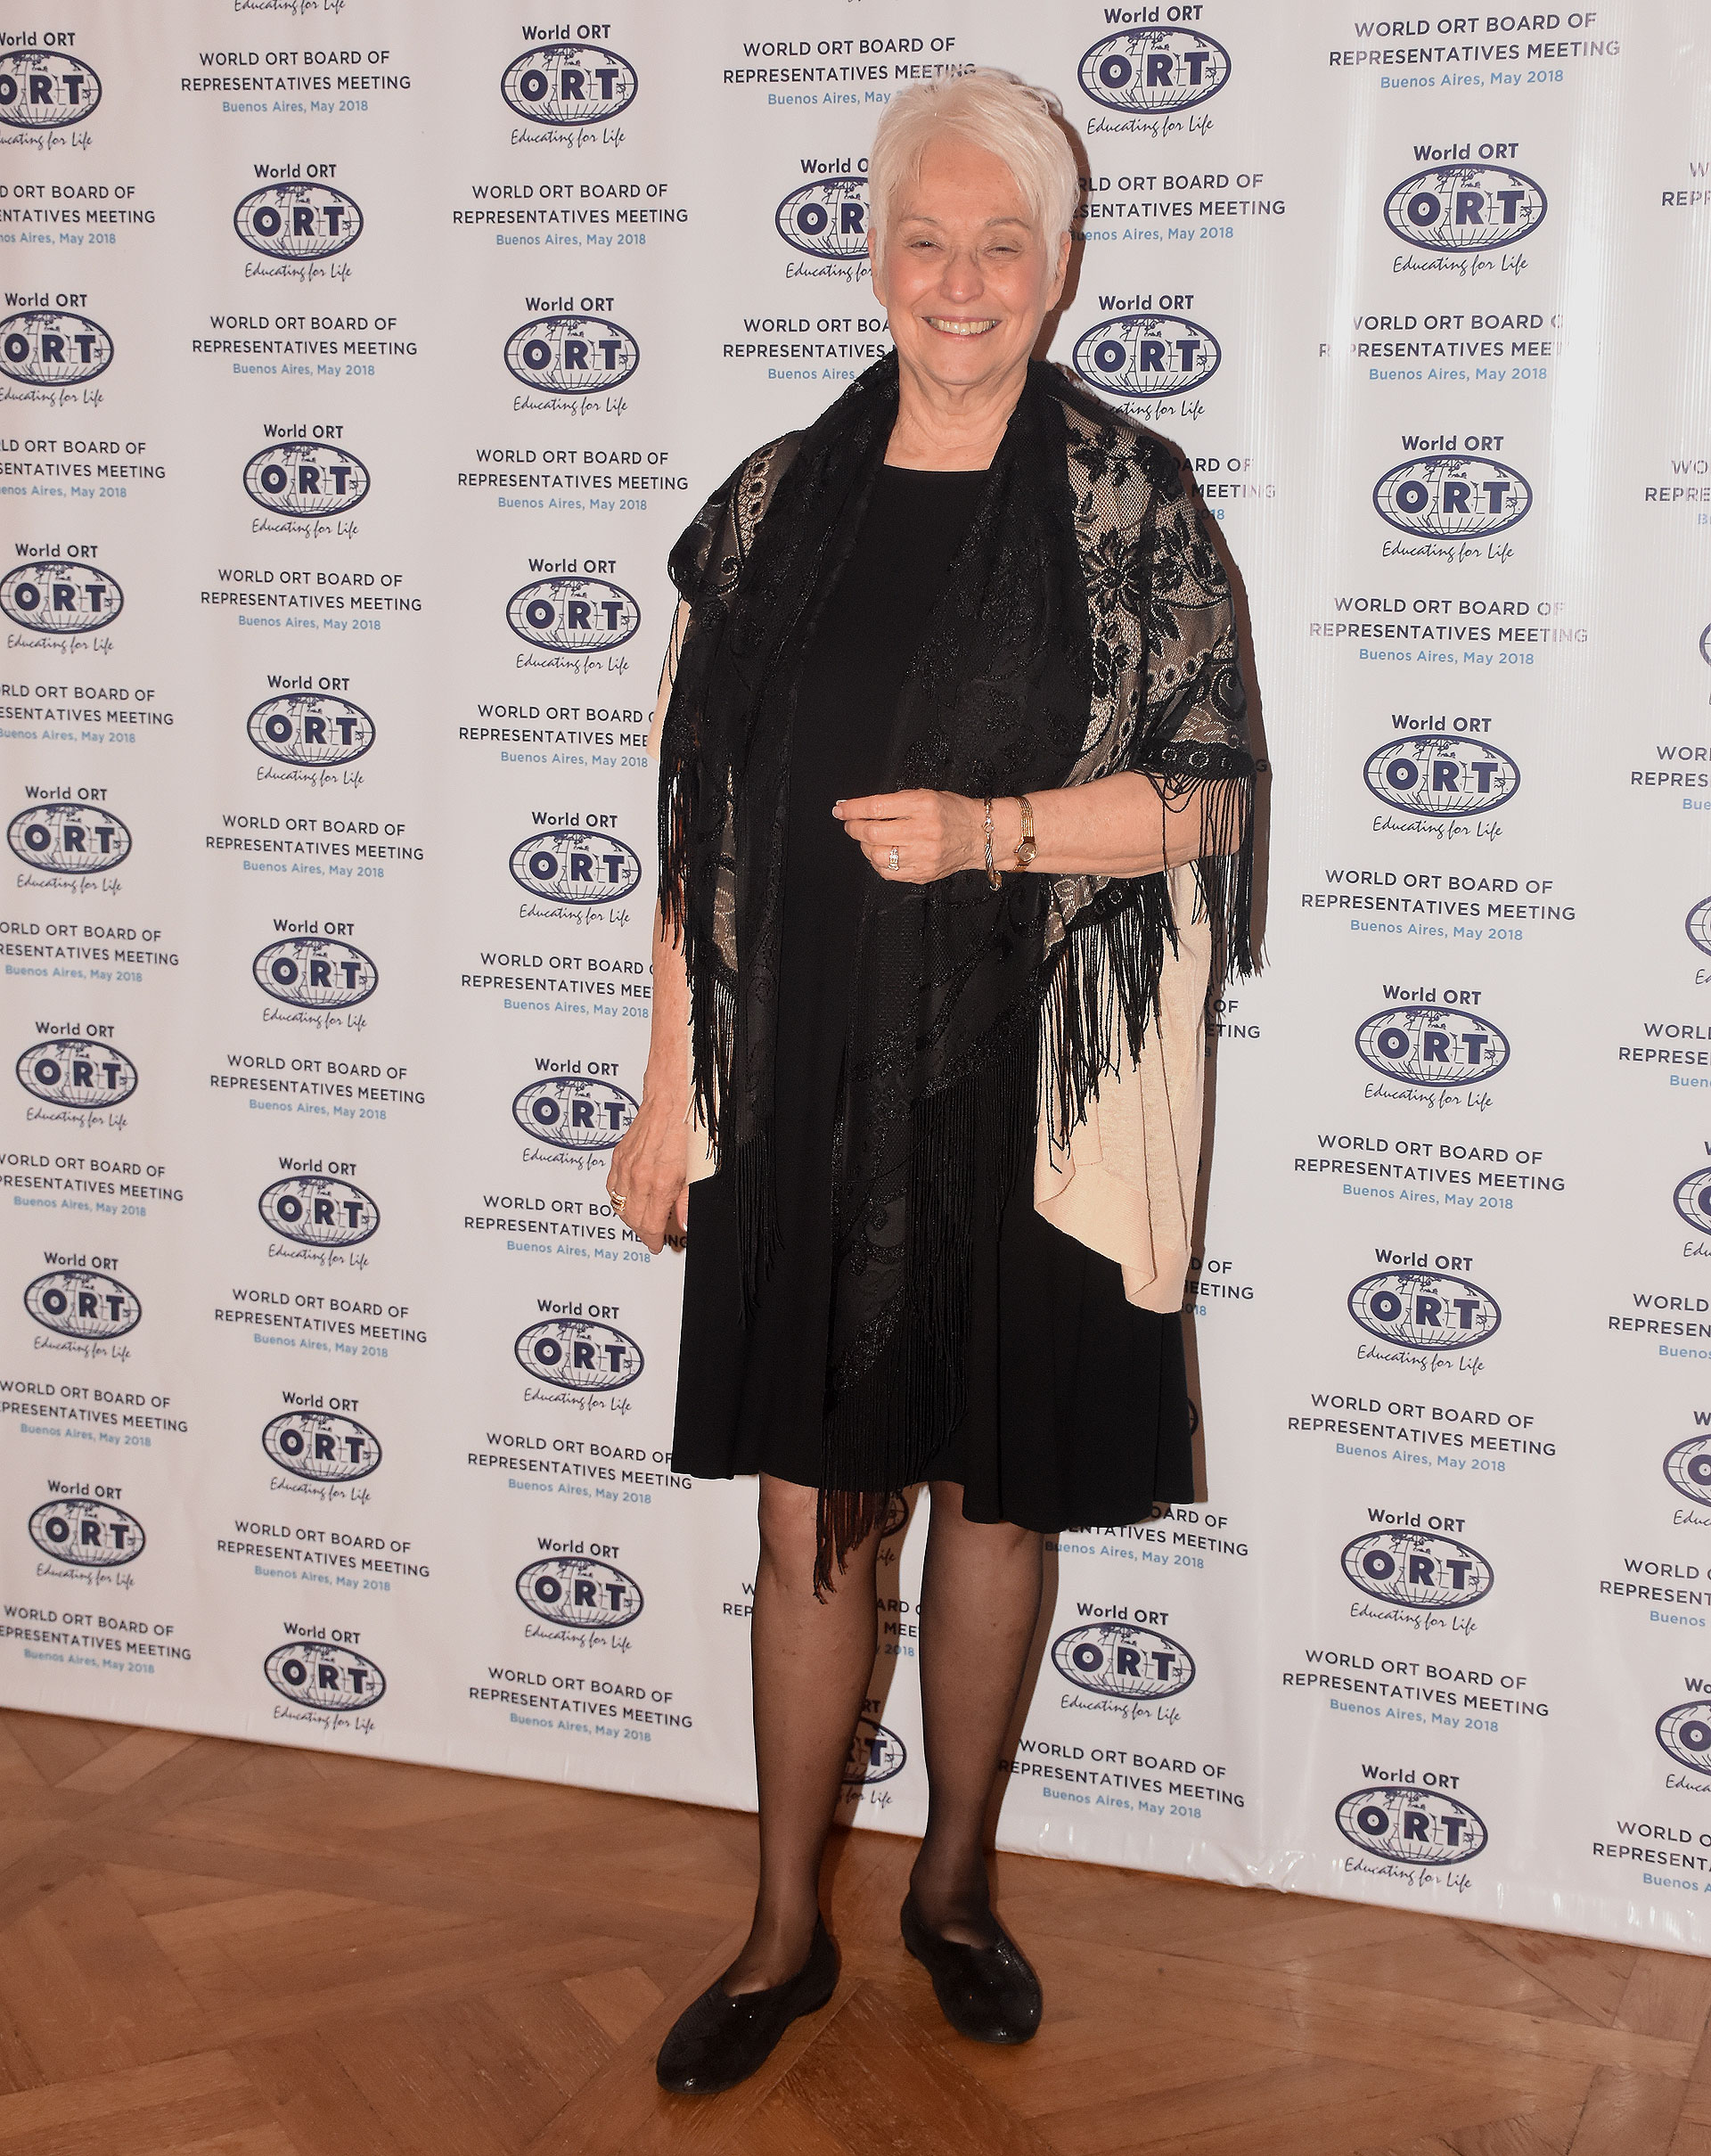 Judi Menikoff, senior official de ORT Mundial